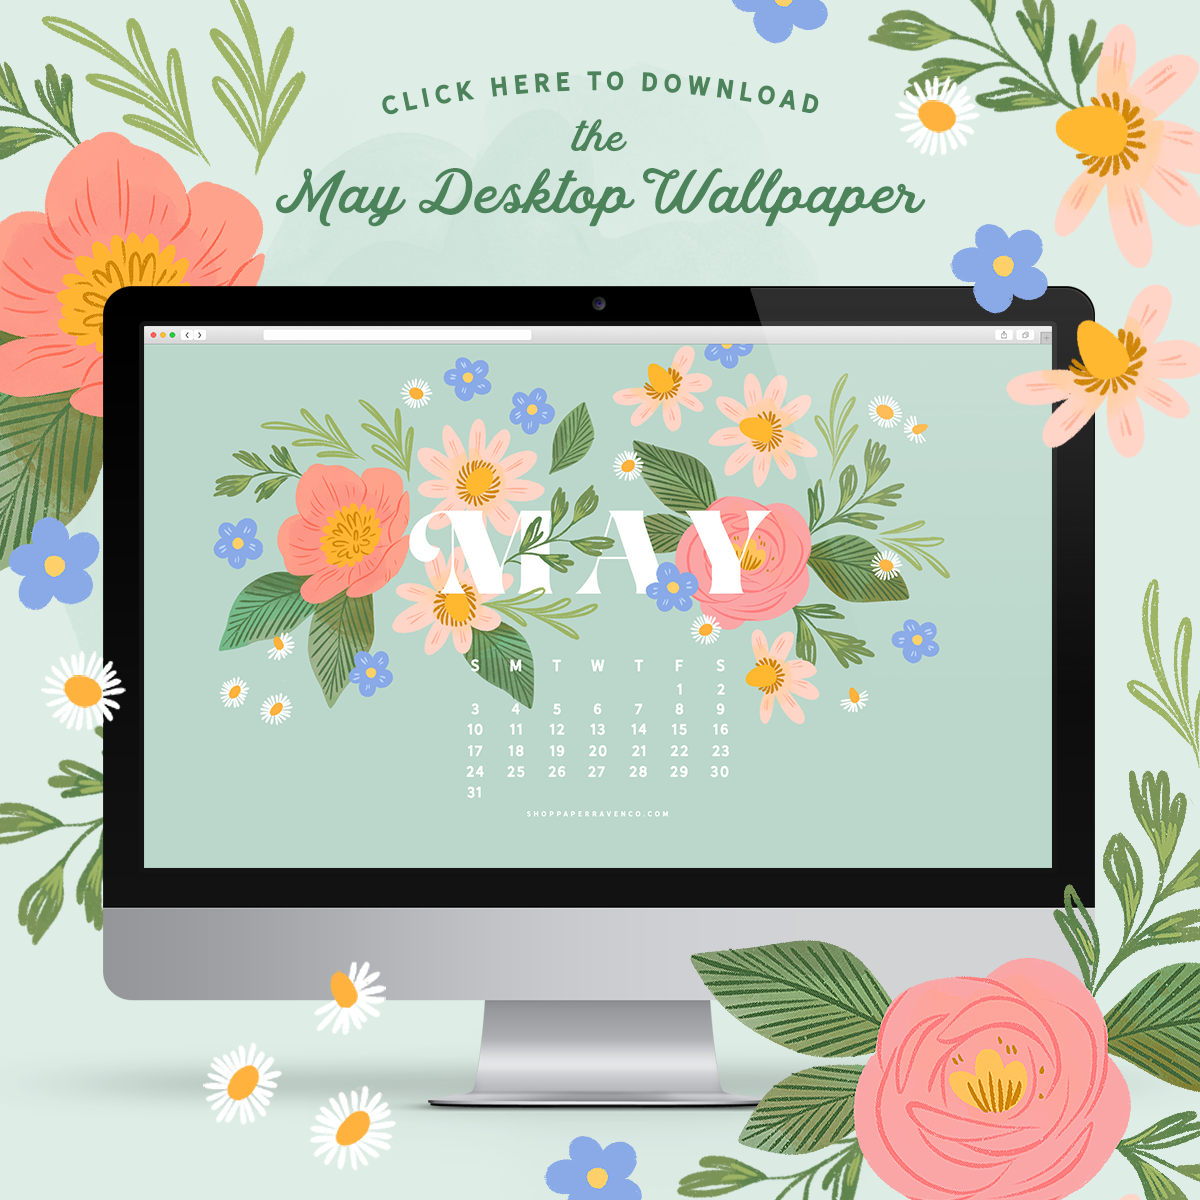 May 2020 Illustrated Desktop Wallpaper by Paper Raven Co. | www.ShopPaperRavenCo.com #desktopwallpaper #desktopdownload #dressyourtech